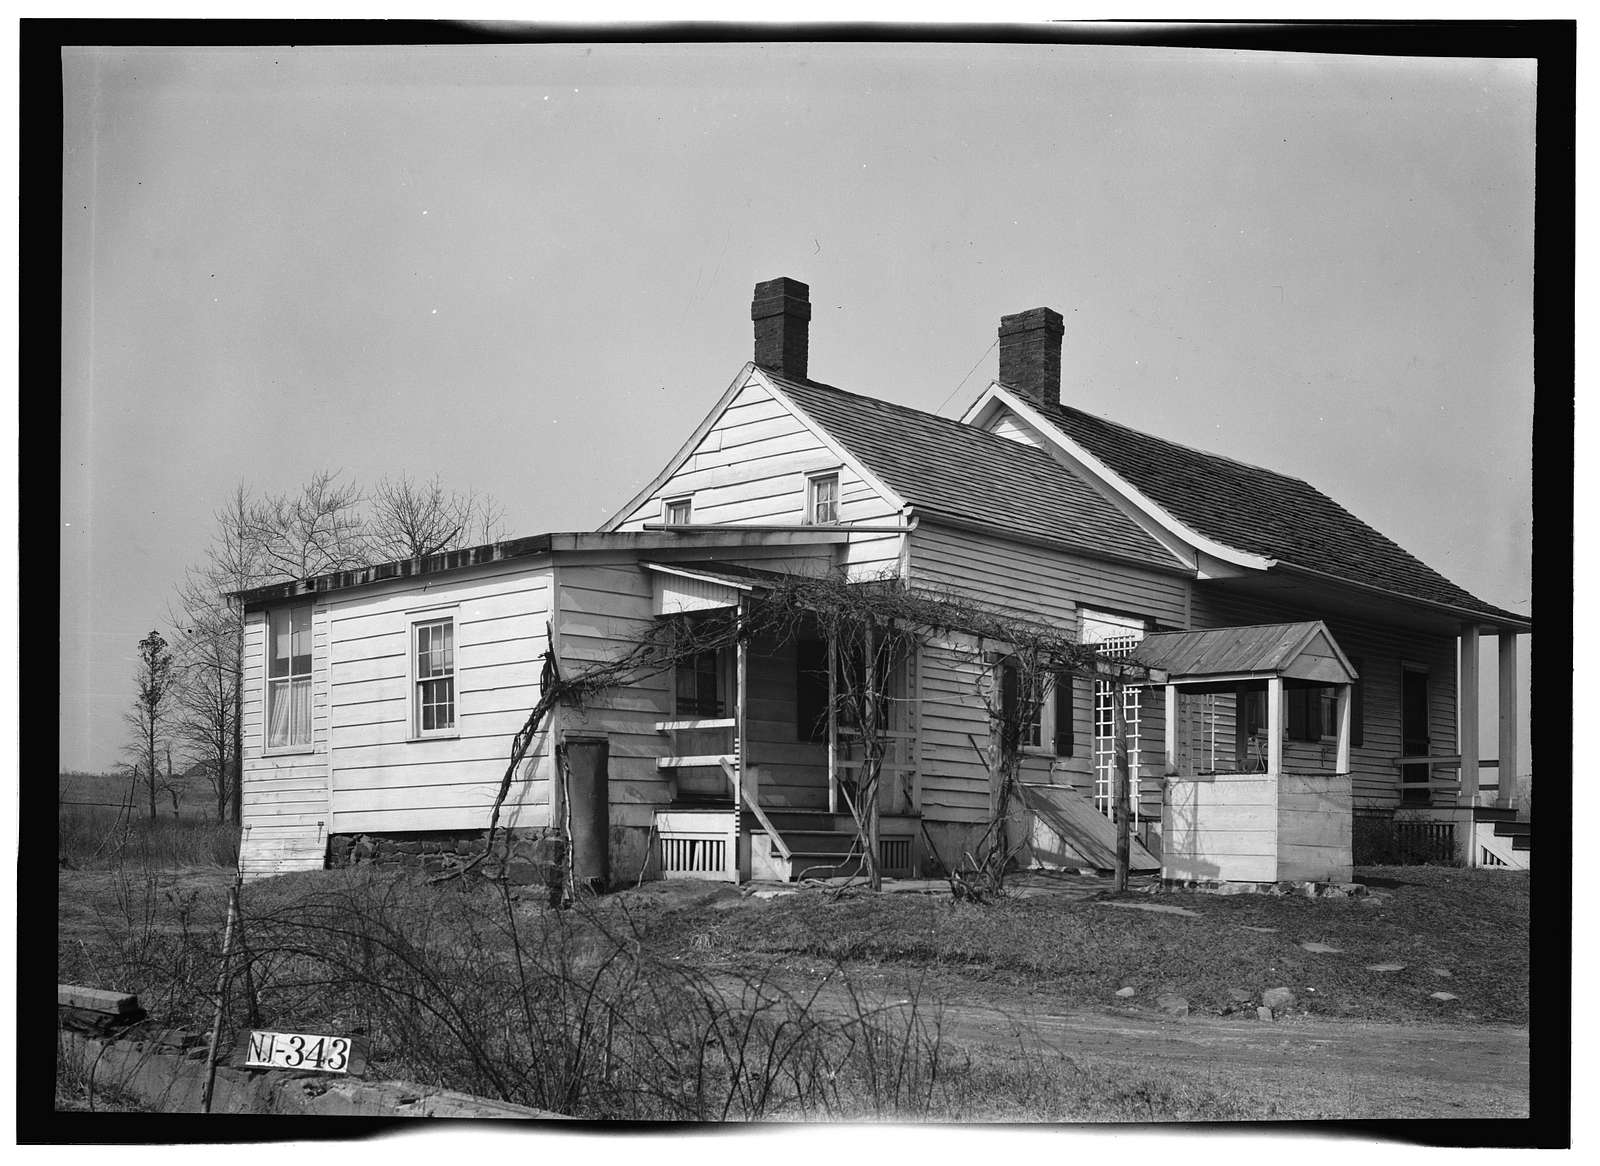 Van Saun House, Howland Avenue, Paramus, Bergen County, NJ